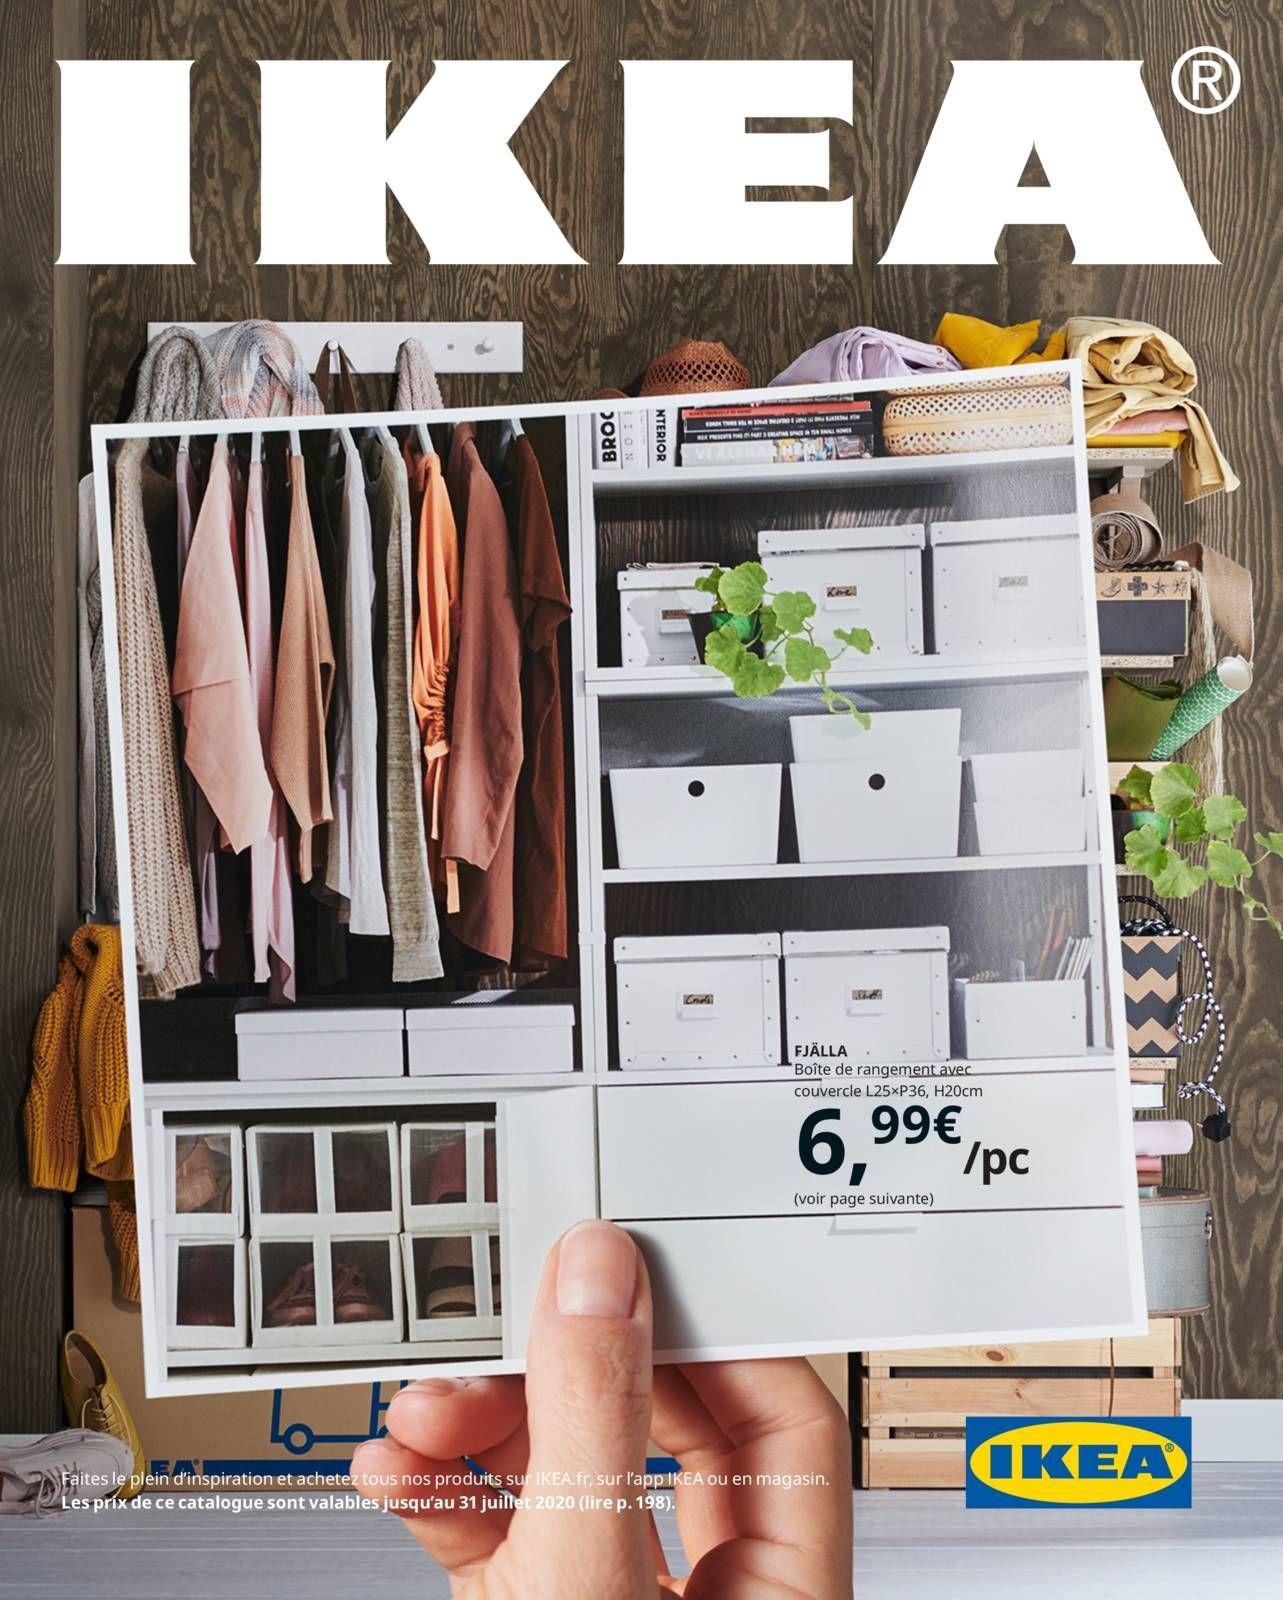 Catalogue Ikea 2020 Catalogue Ikea Printemps 2020 En 2020 Mobilier De Salon Ikea Catalogue Ikea